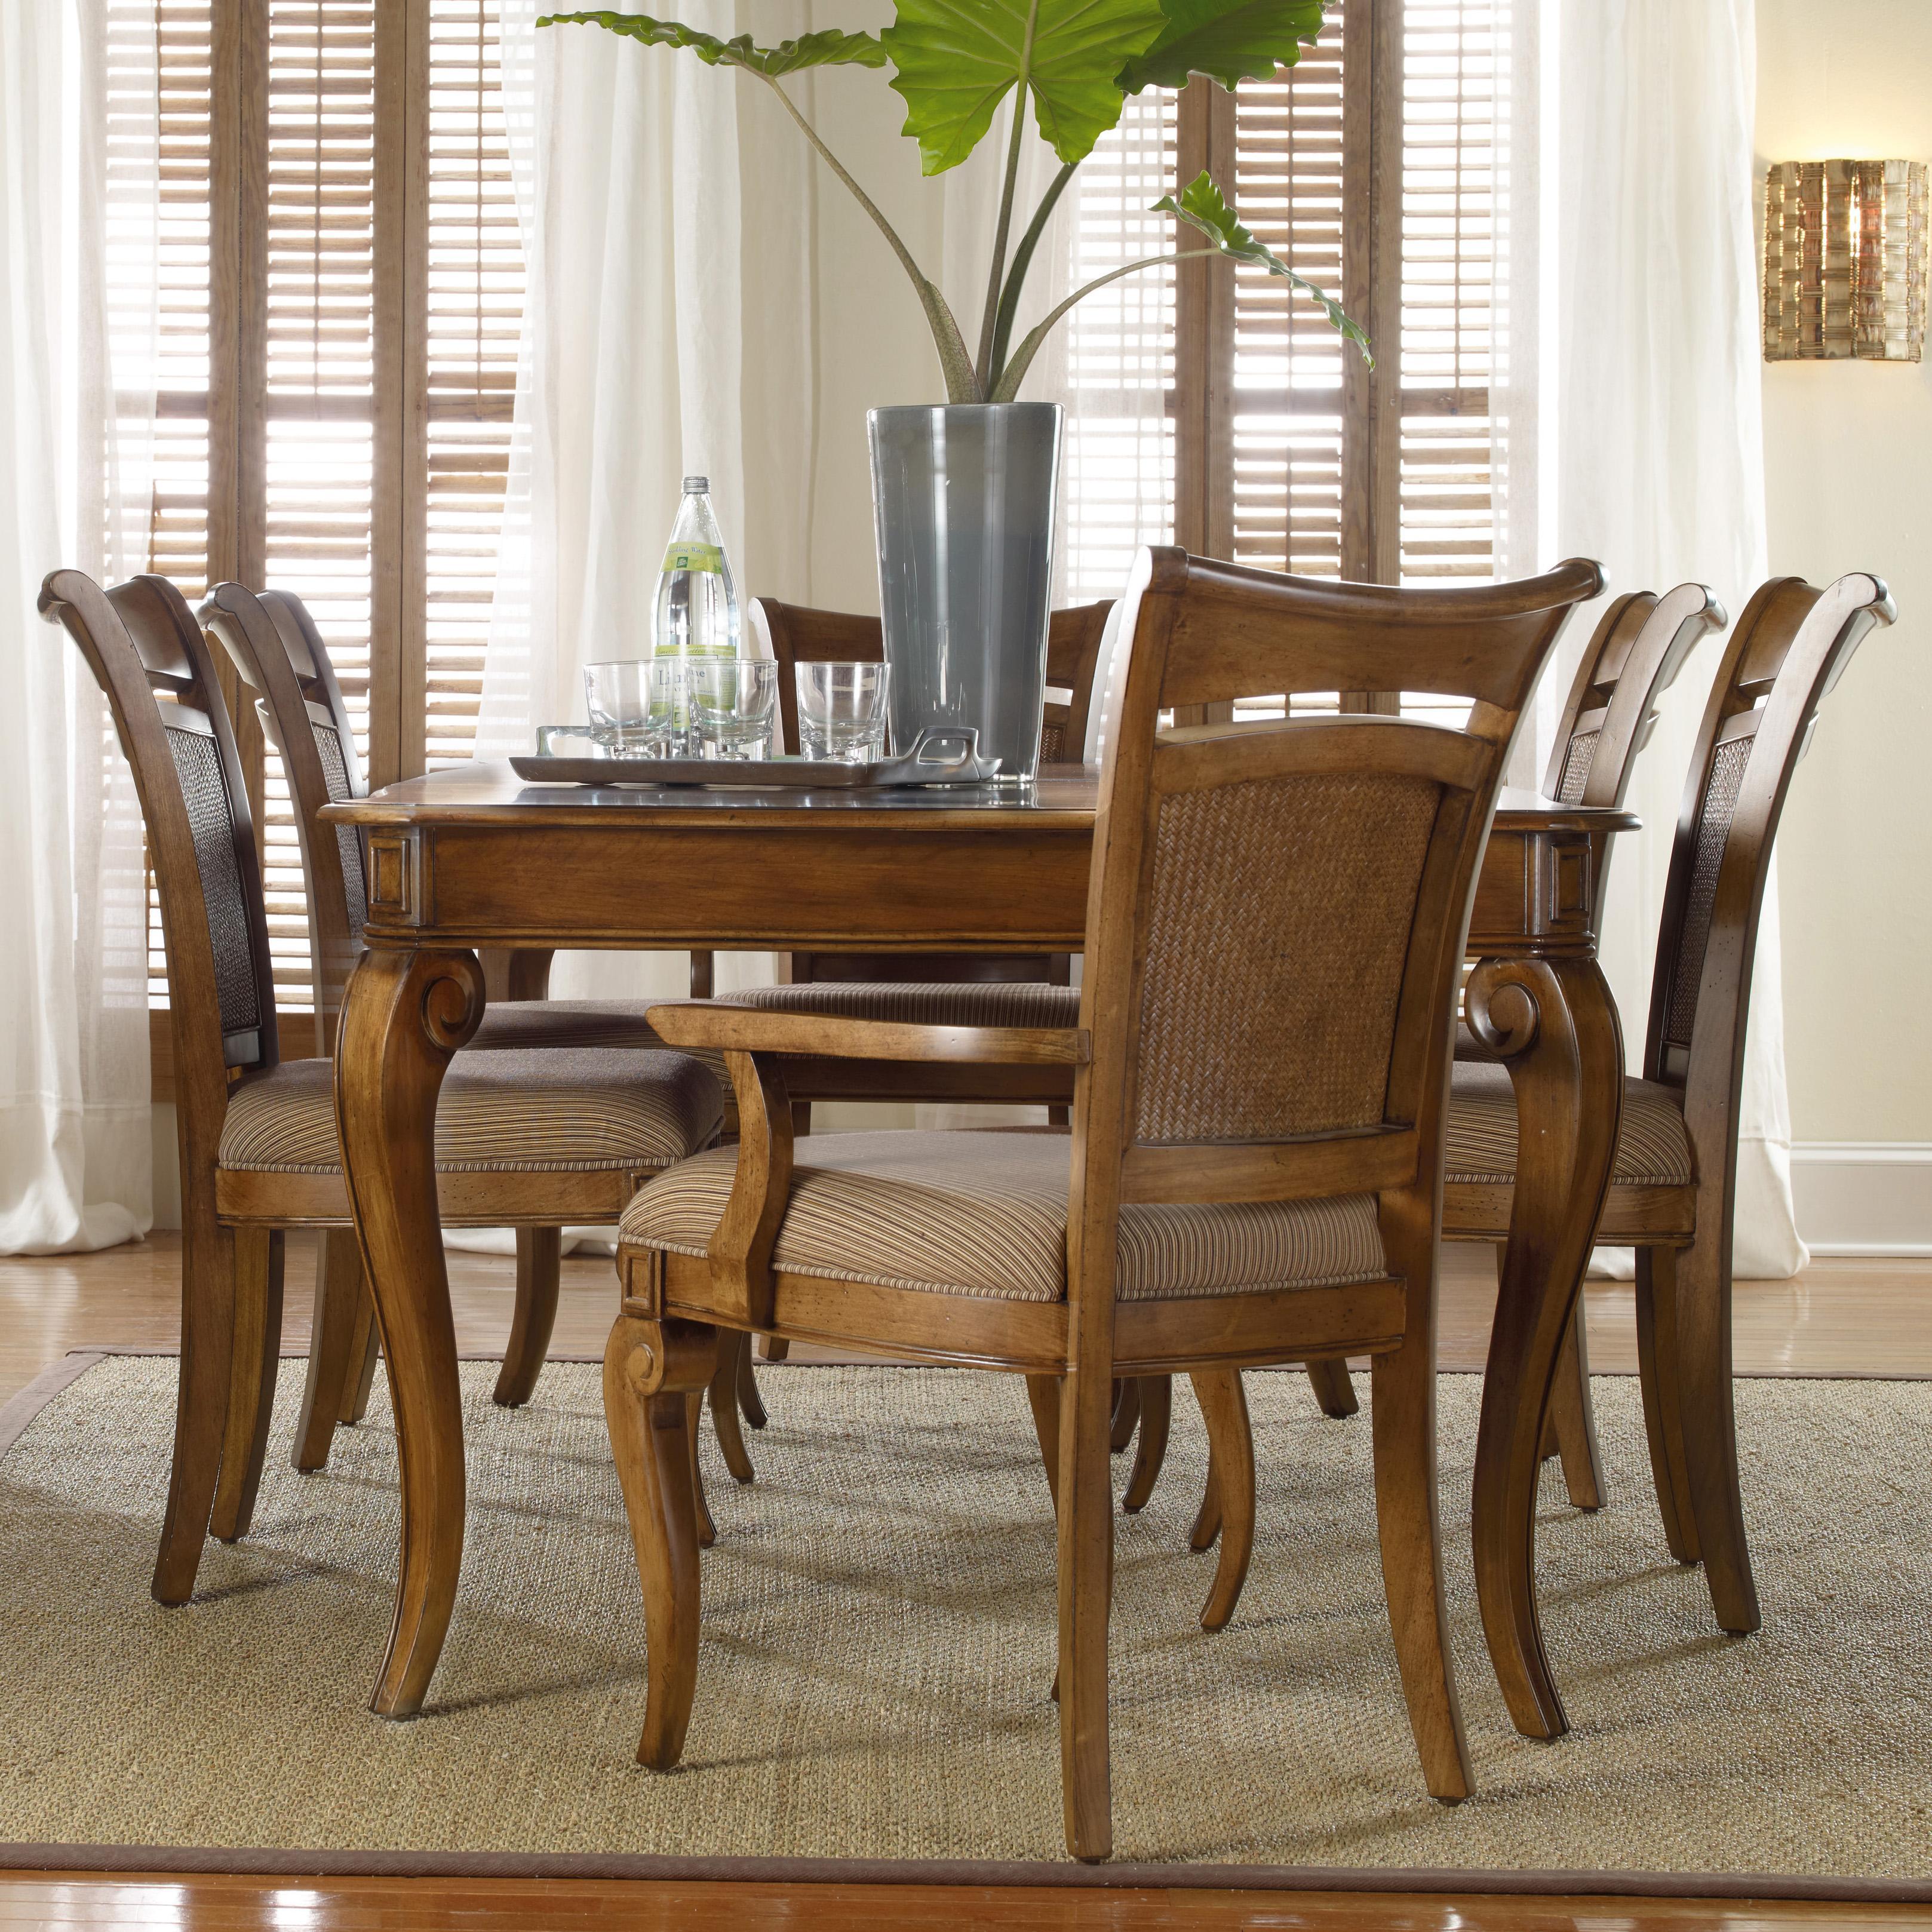 Windward Rectangular Leg Dining Table U0026 Raffia Chairs Set By Hooker  Furniture